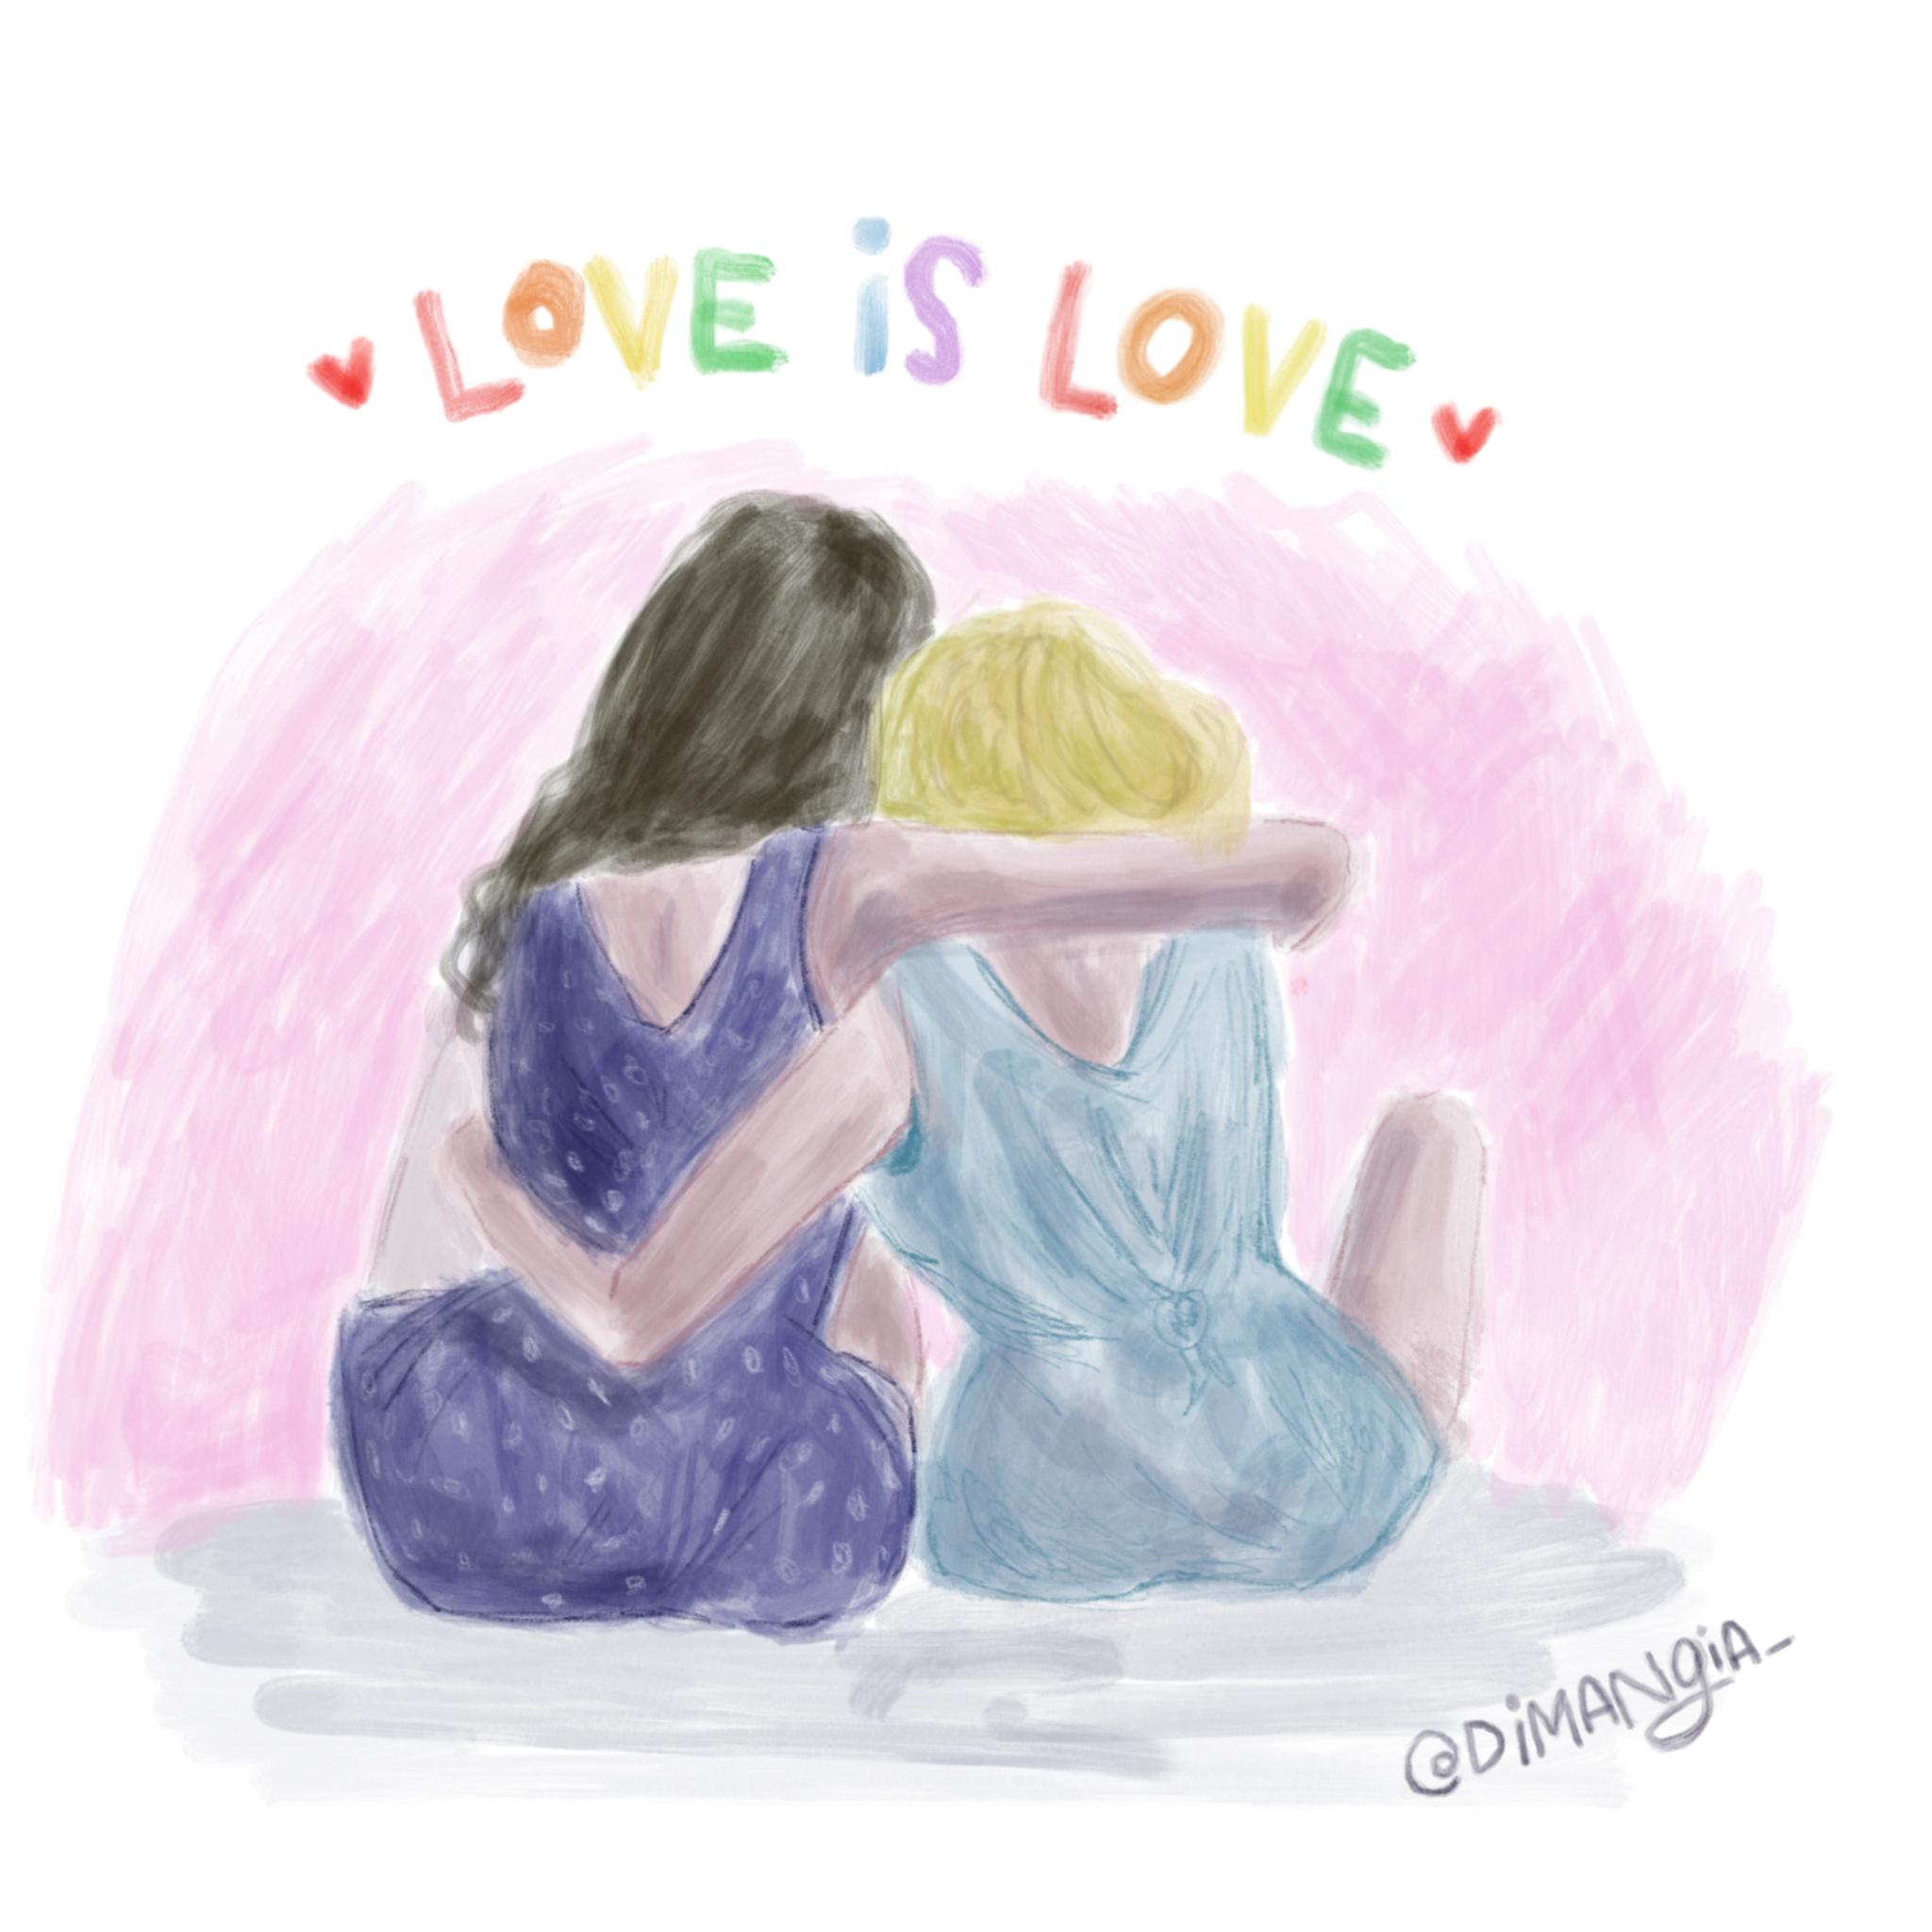 Love is love.  Pride 💕 orgullo      #illustration #illustracion #ilustracion #dibujo #drawing #drawoftheday #draw #sketch #design #graphic #graphicdesign #art #arte #designer #instaart #instaartist #instart #love #amor #live #feminismo #feminism #woman #mujer #love #sororidad #girlpower #pride #loveislove #gay #orgullo #torta